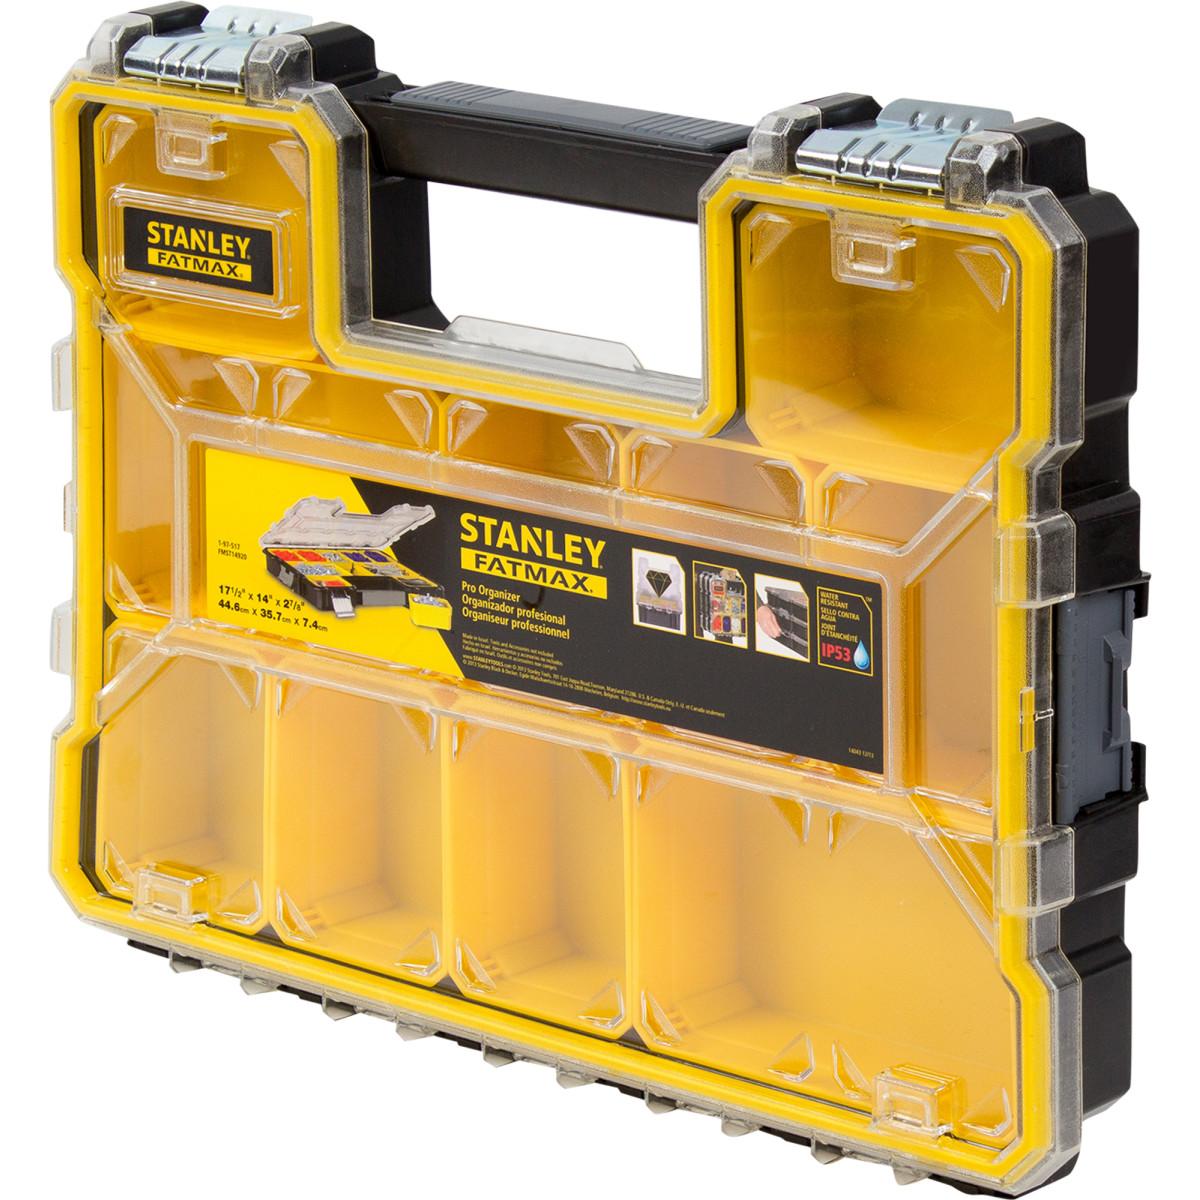 Органайзер Fatmax Shallow Pro Metal Latch влагозащищенный 446х357х74 мм 10 ящиков пластик/металл